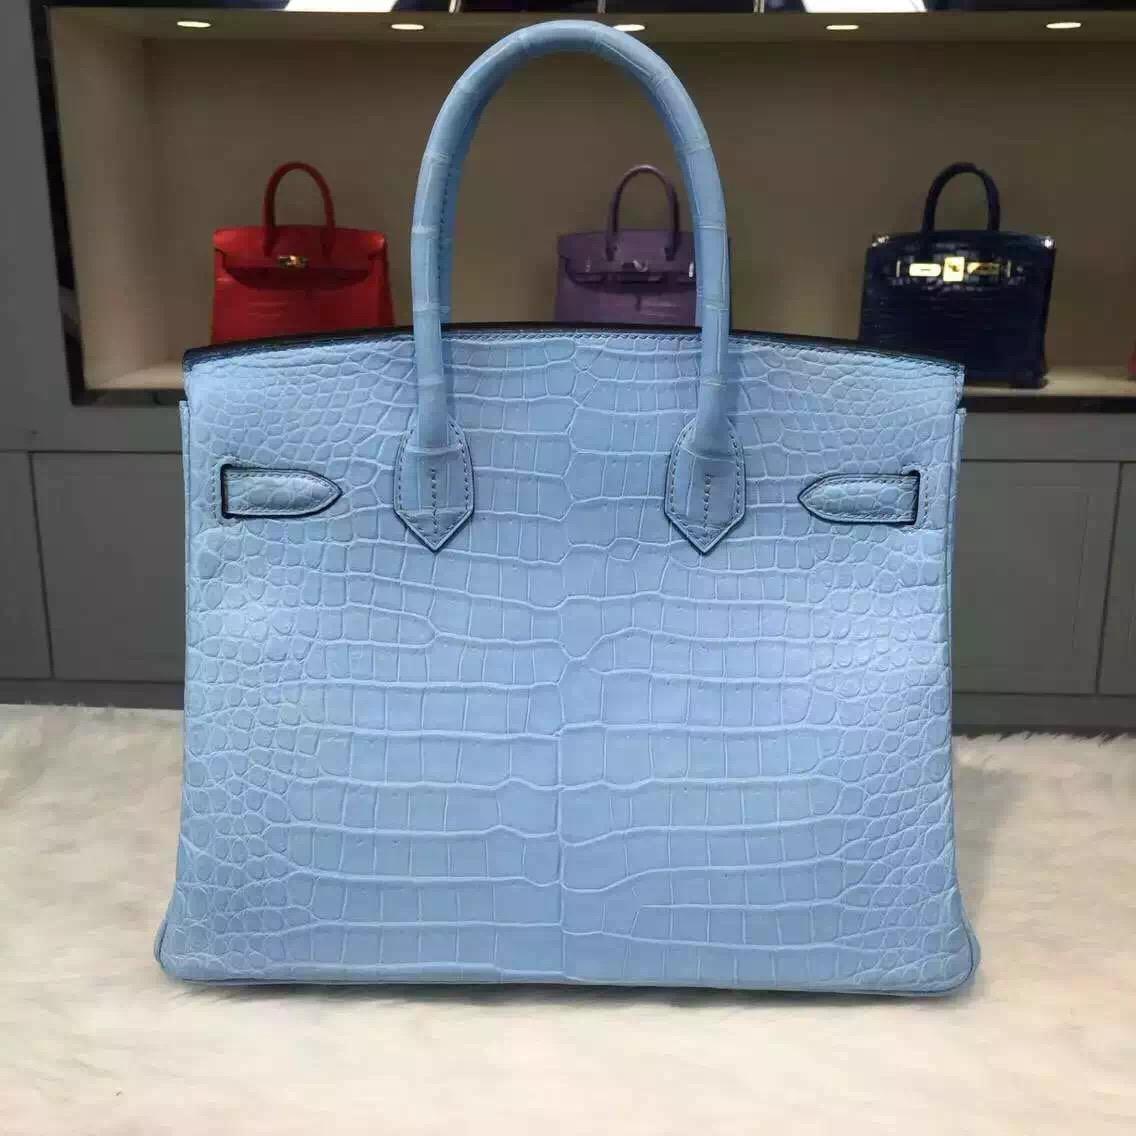 Wholesale Hermes Crocodile Leather Birkin Bag 30cm in 7N Candy Blue